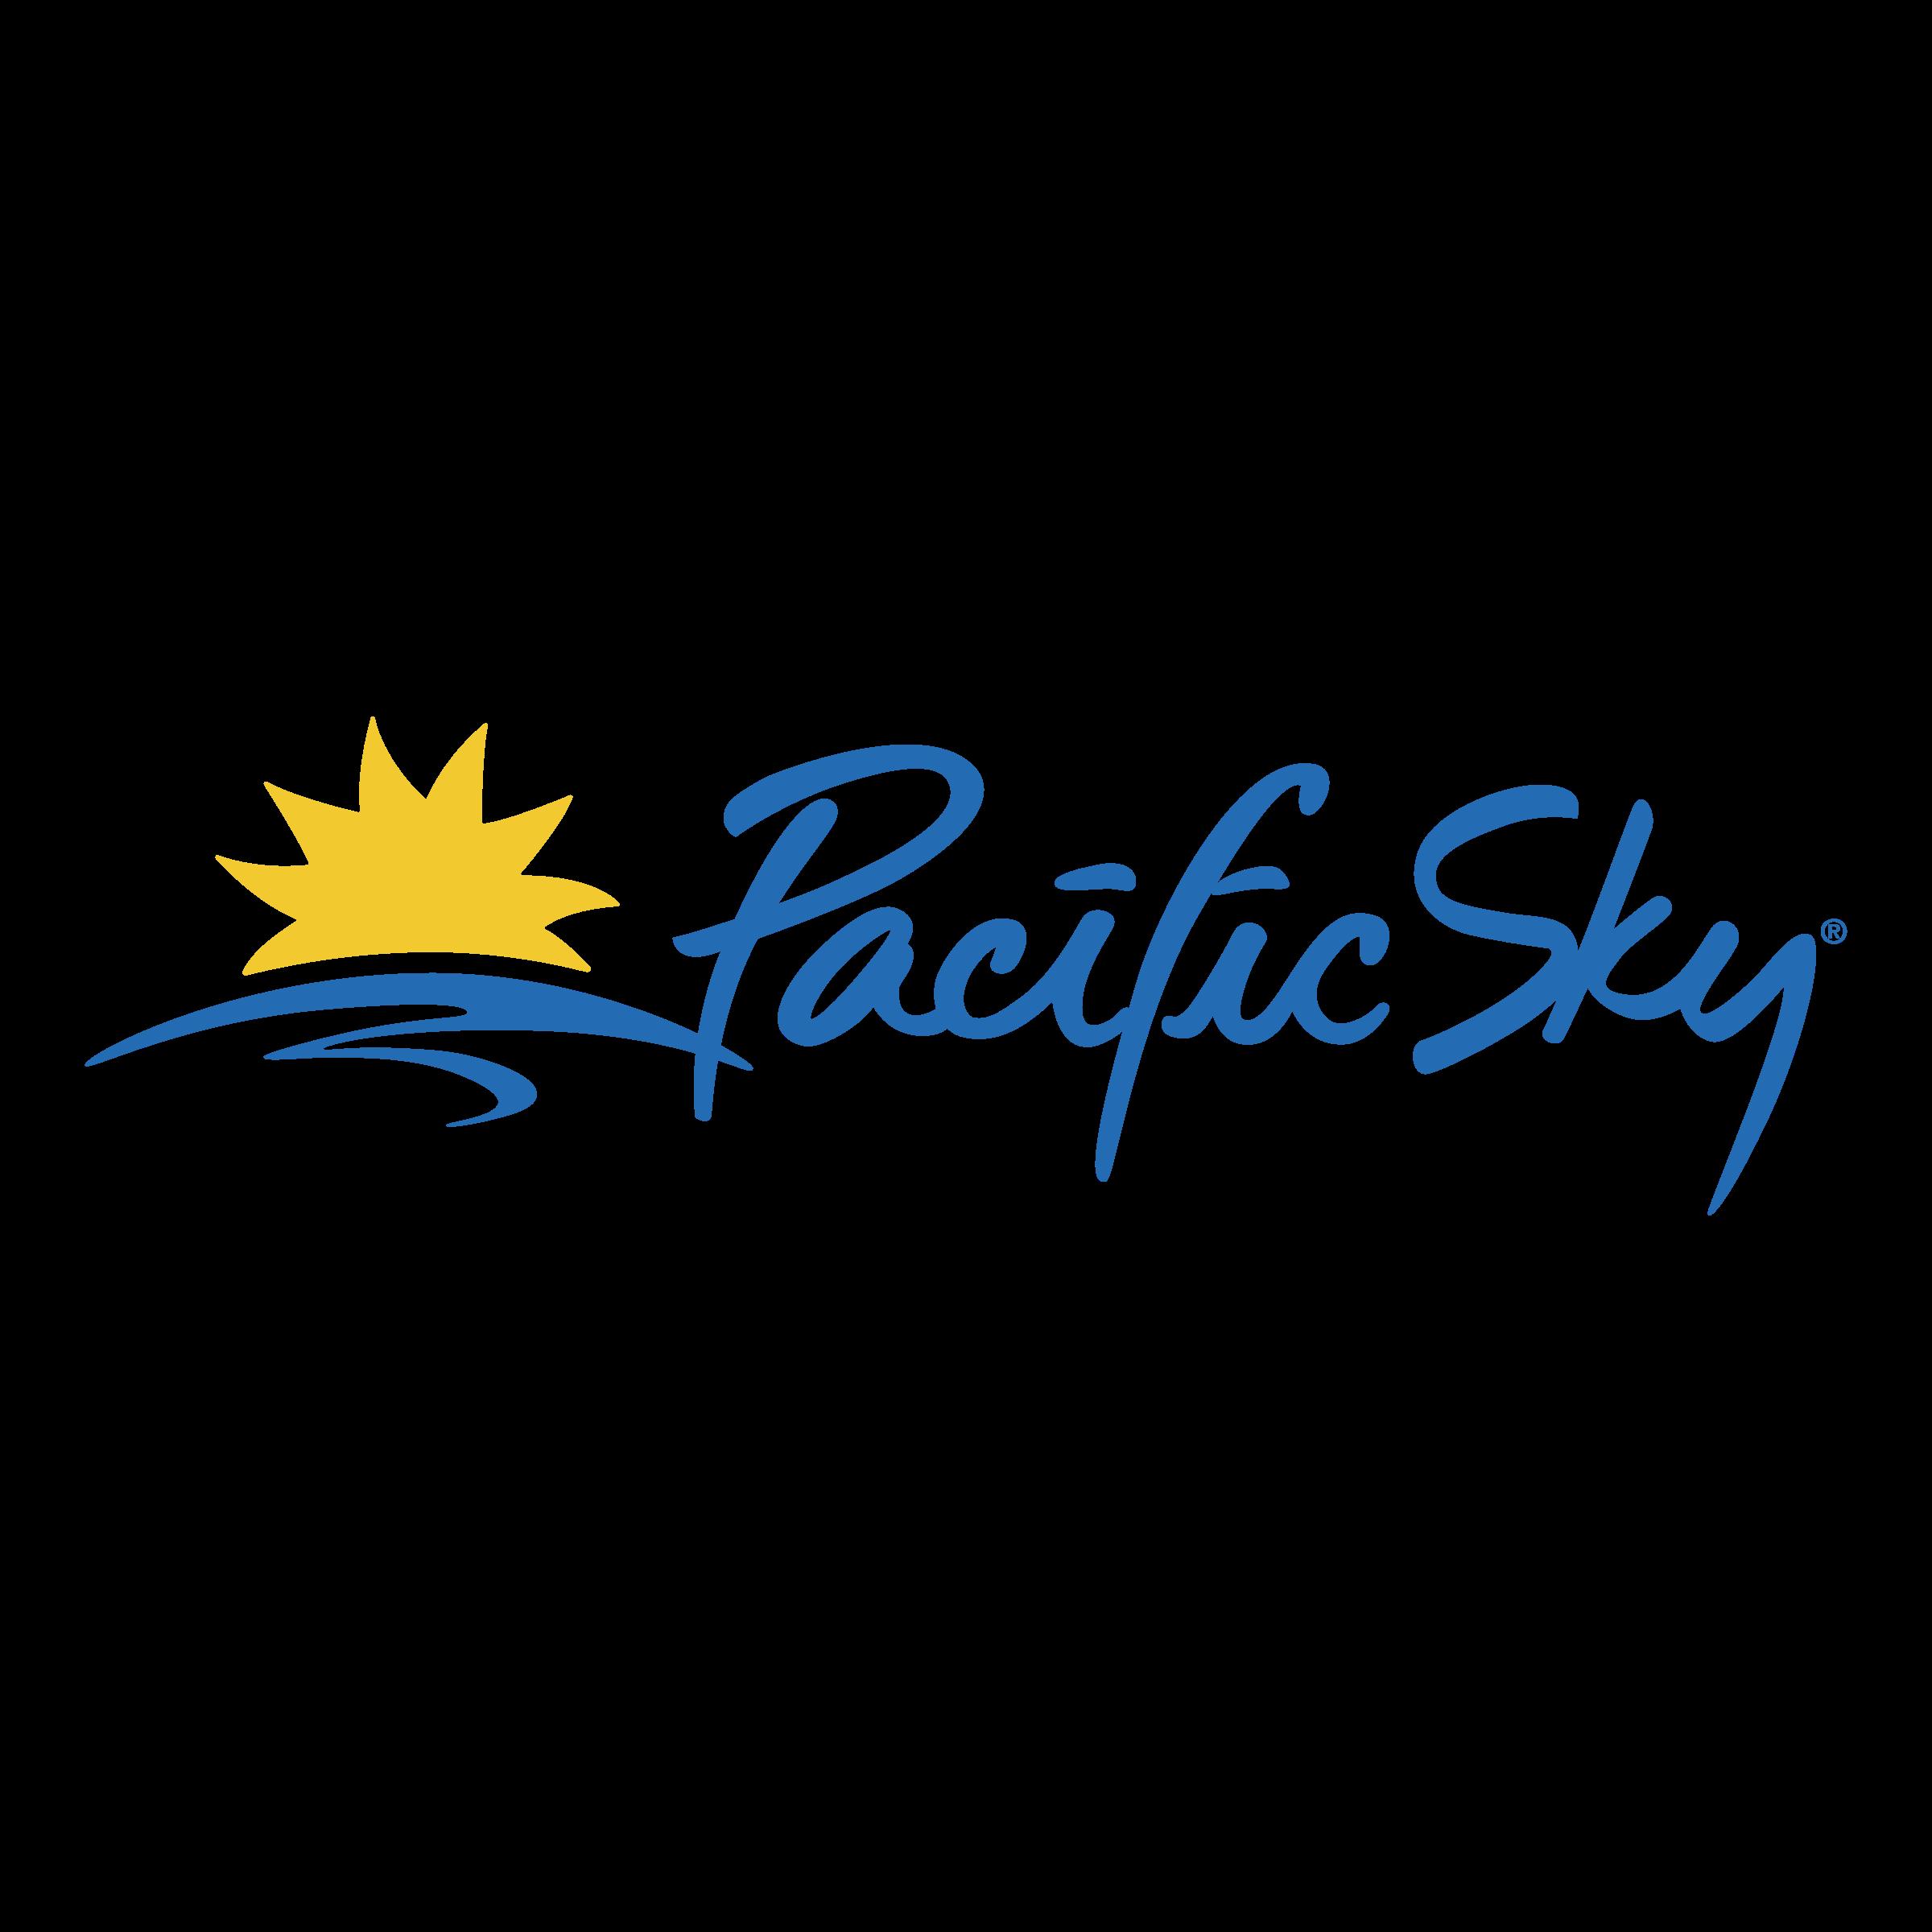 Pacific Sky Logo PNG Transparent & SVG Vector.